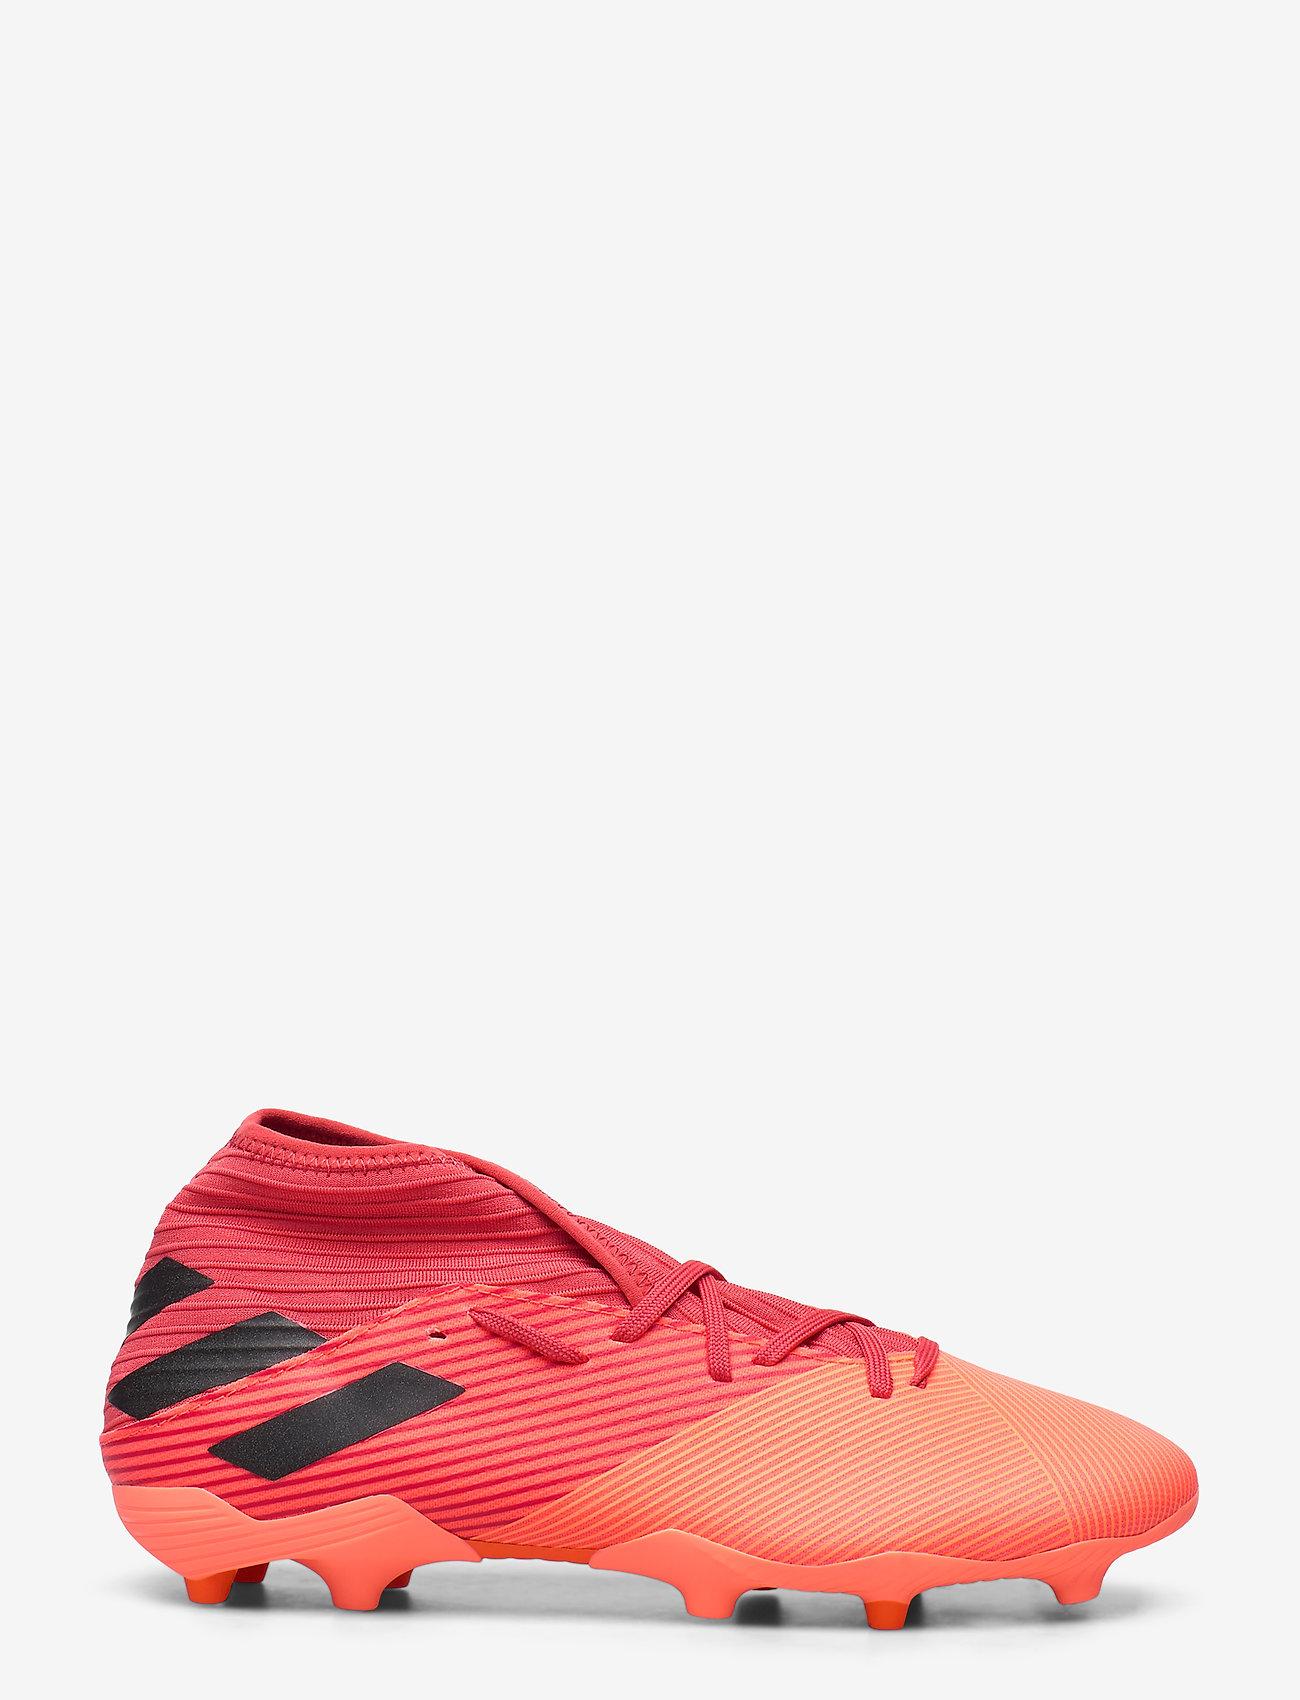 adidas Performance - NEMEZIZ 19.3 FG - fodboldsko - sigcor/cblack/glored - 1